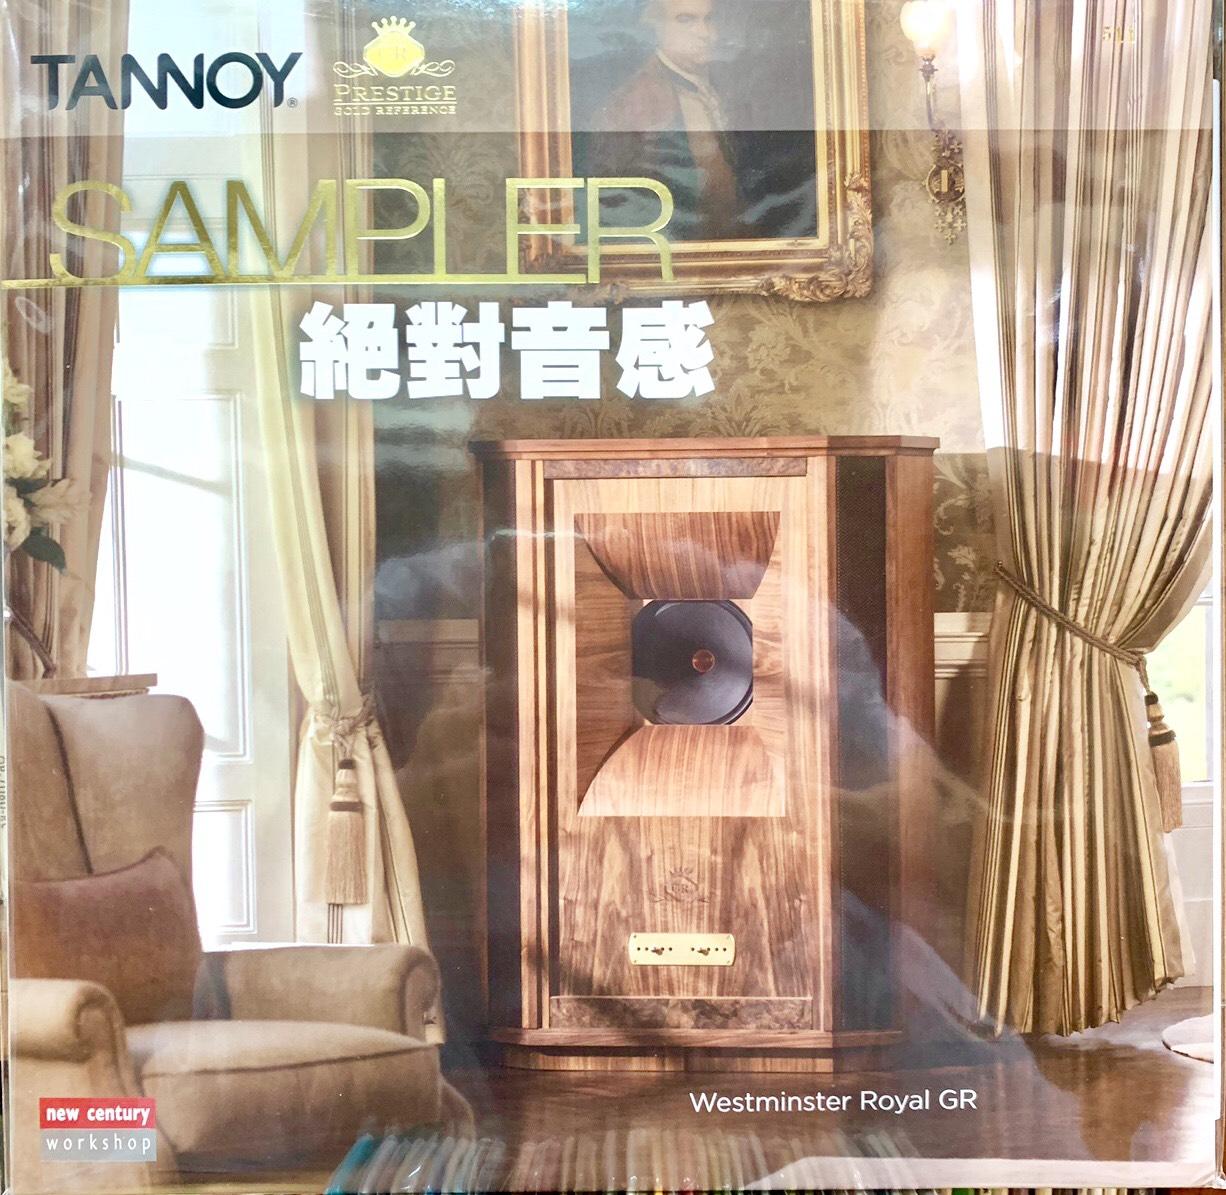 dia-than-lp-tannoy-sampler